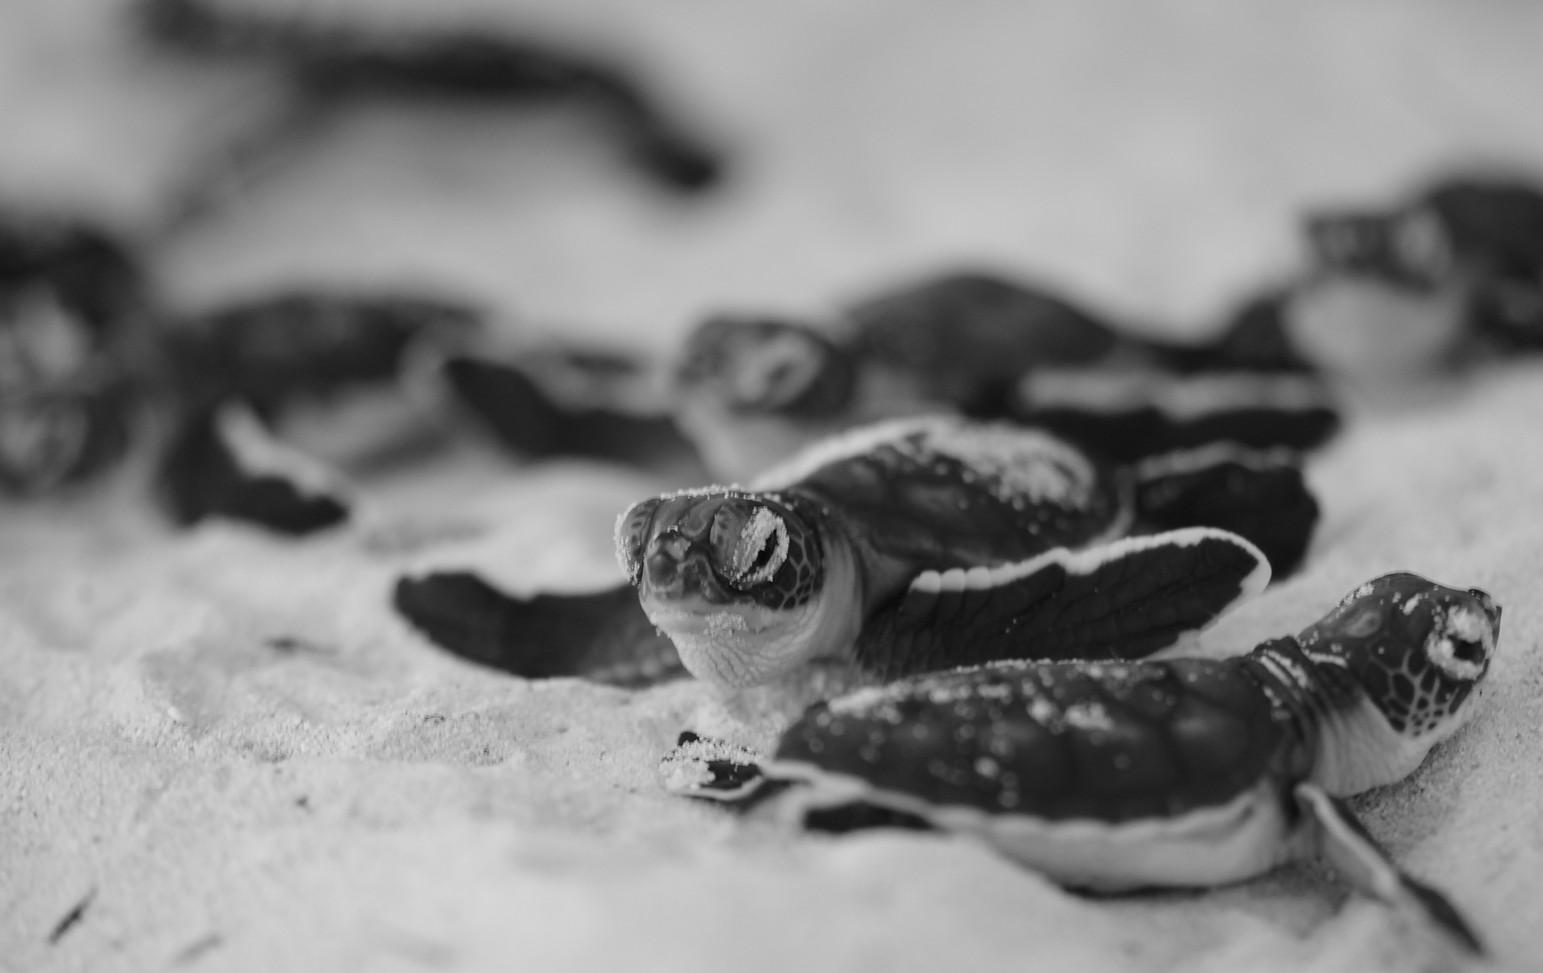 Tanzania - Fanjove Island - baby turtles